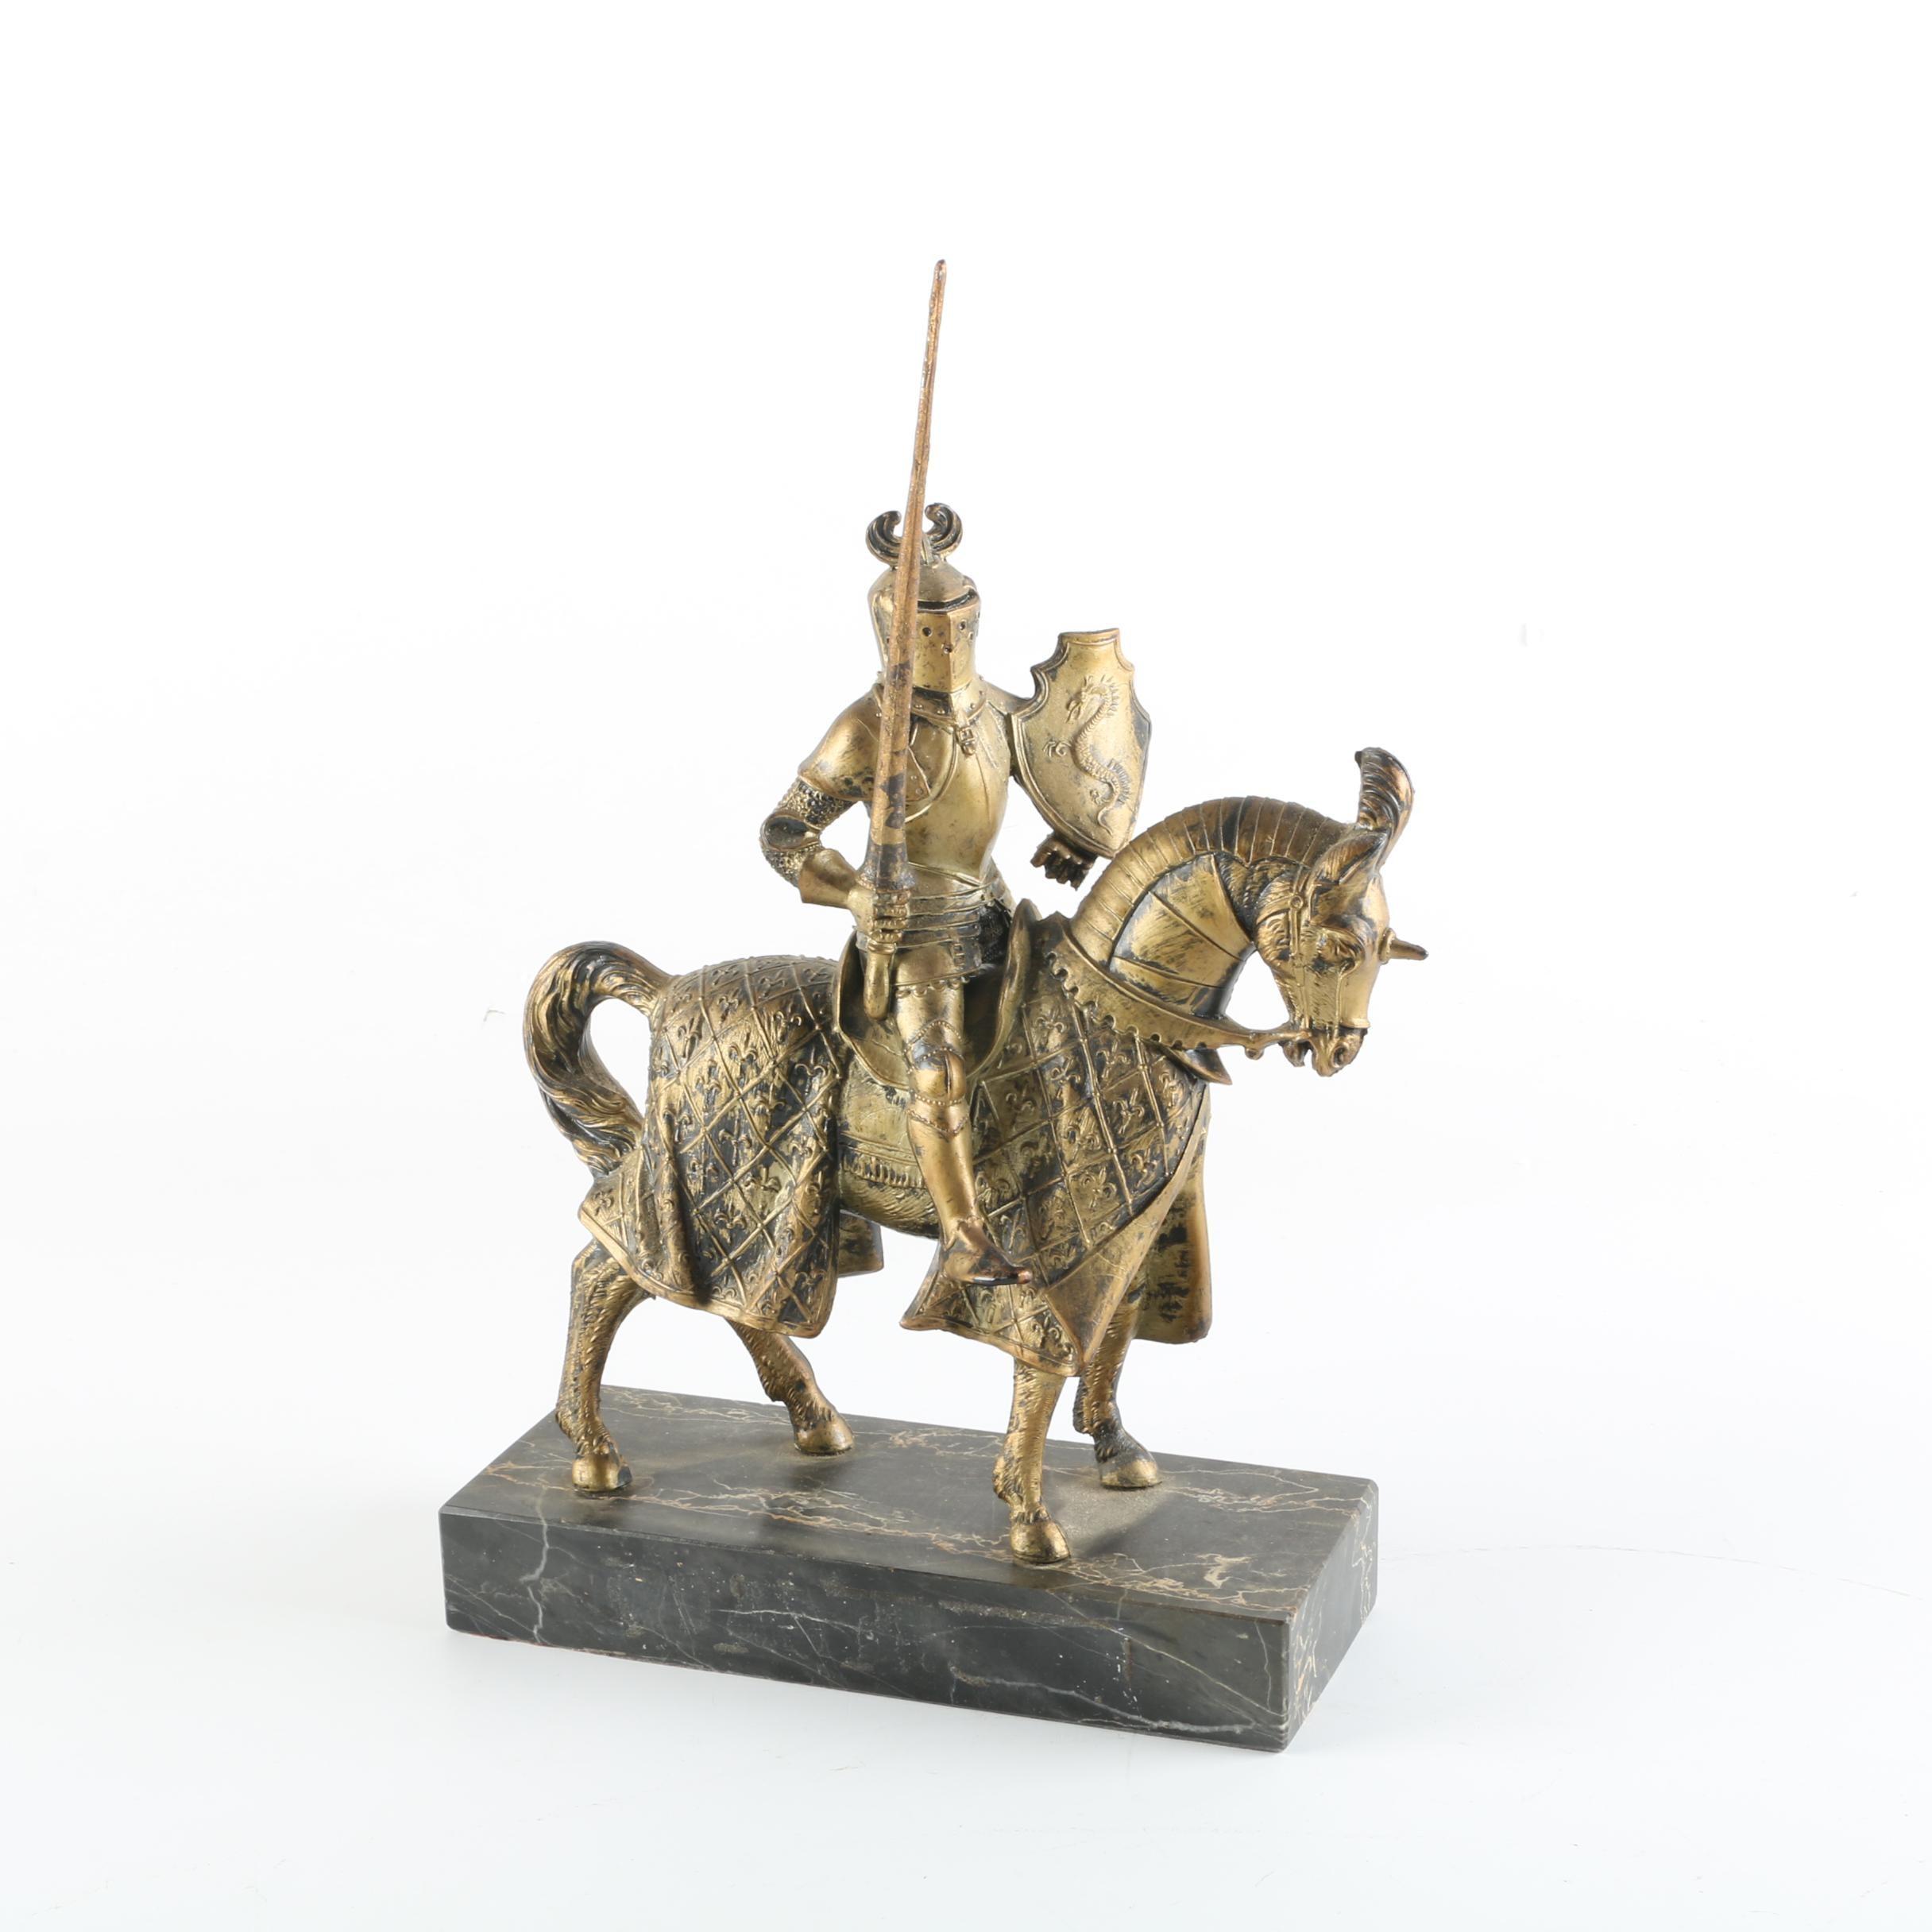 Depose Italy Knight Figurine on Marble Base